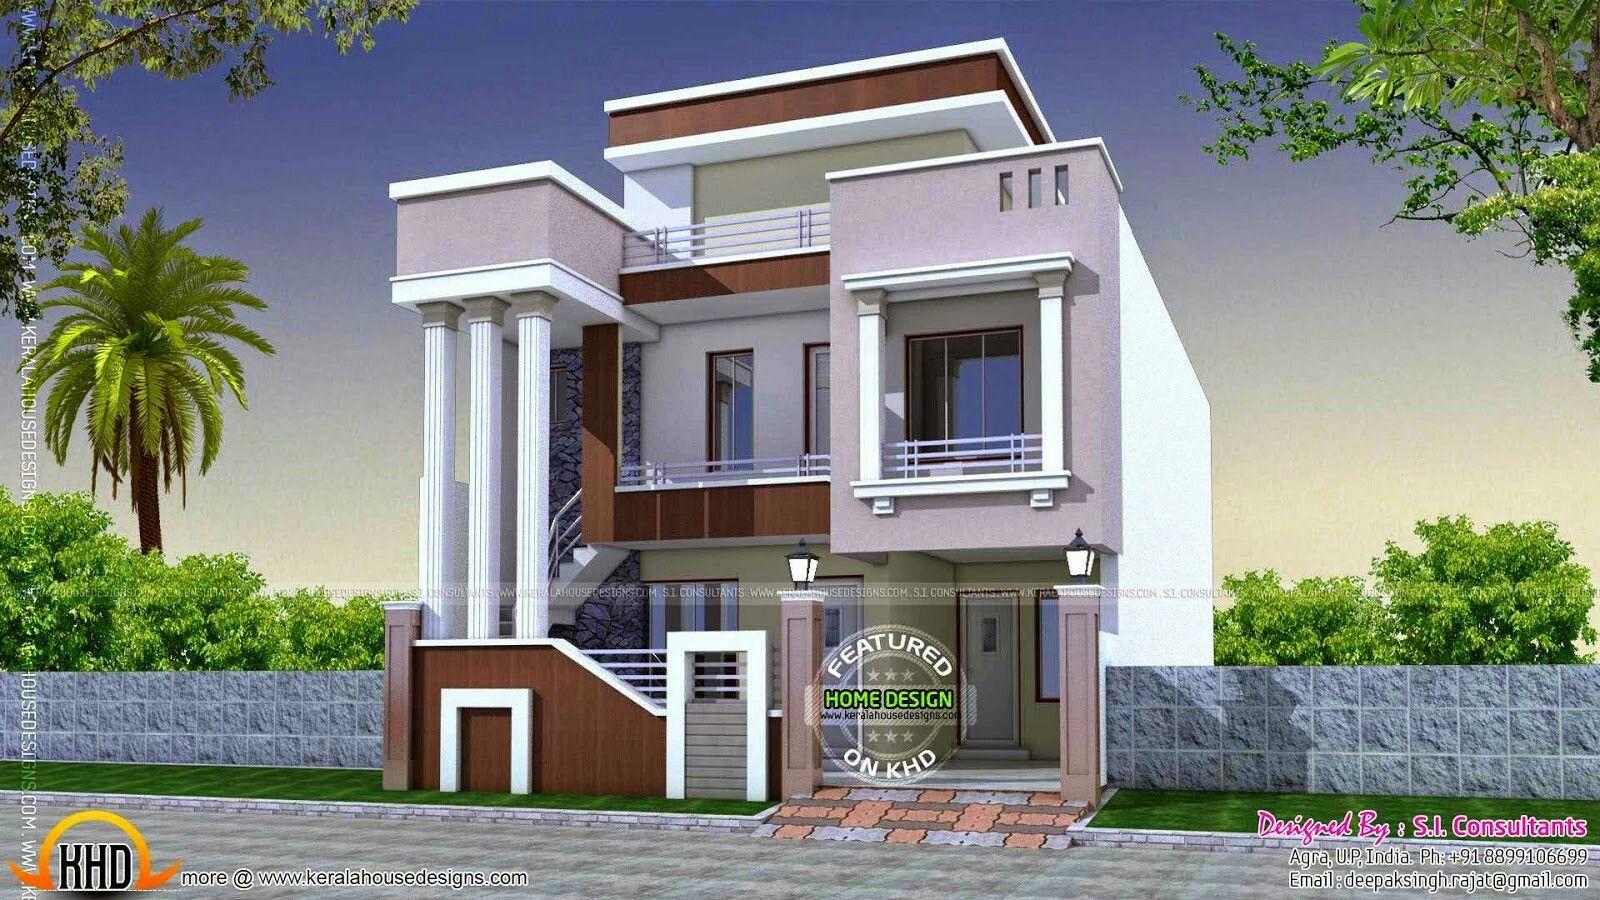 Moderne Hausentwürfe pin azhar masood auf house elevation indian compact